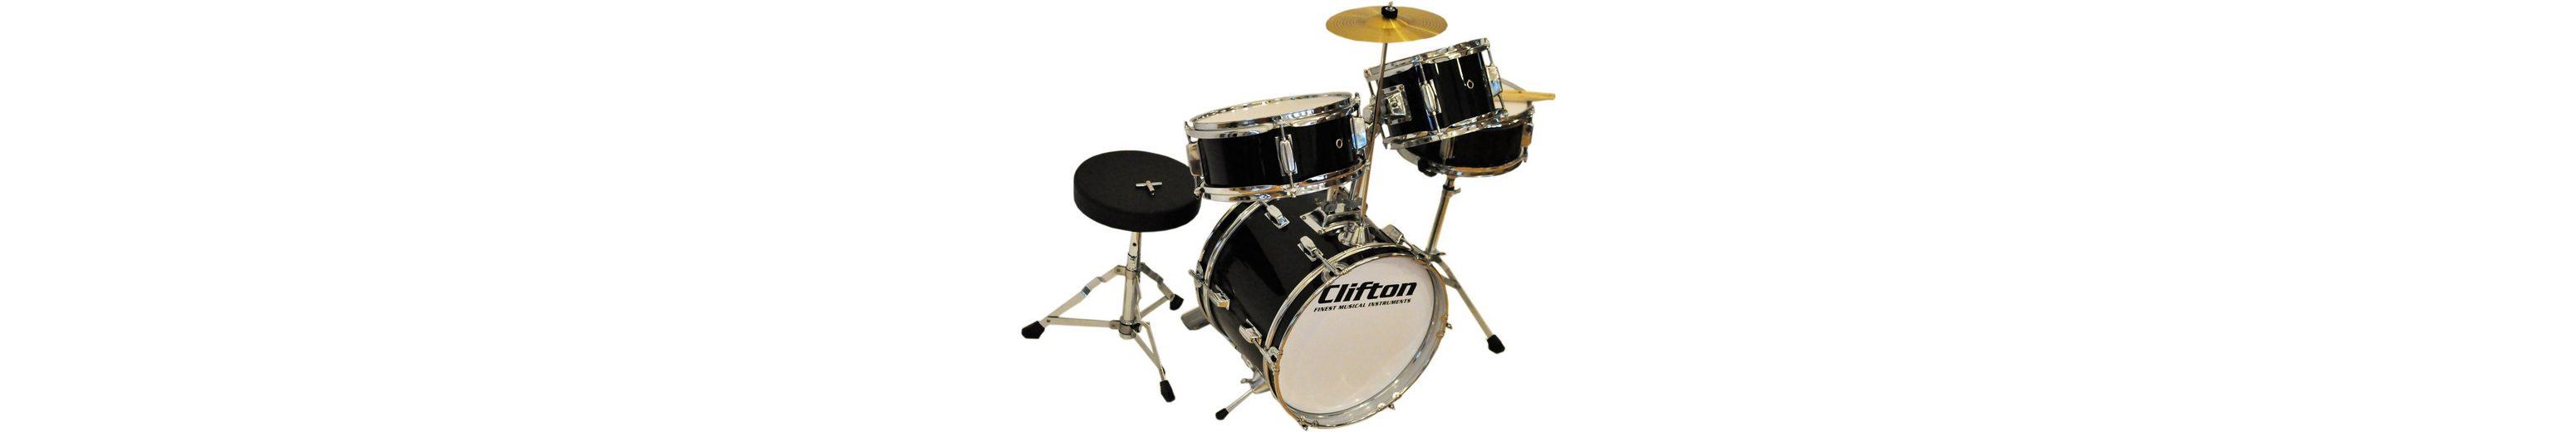 Clifton Kinder Schlagzeug, »Junior Akustik Drum Set«